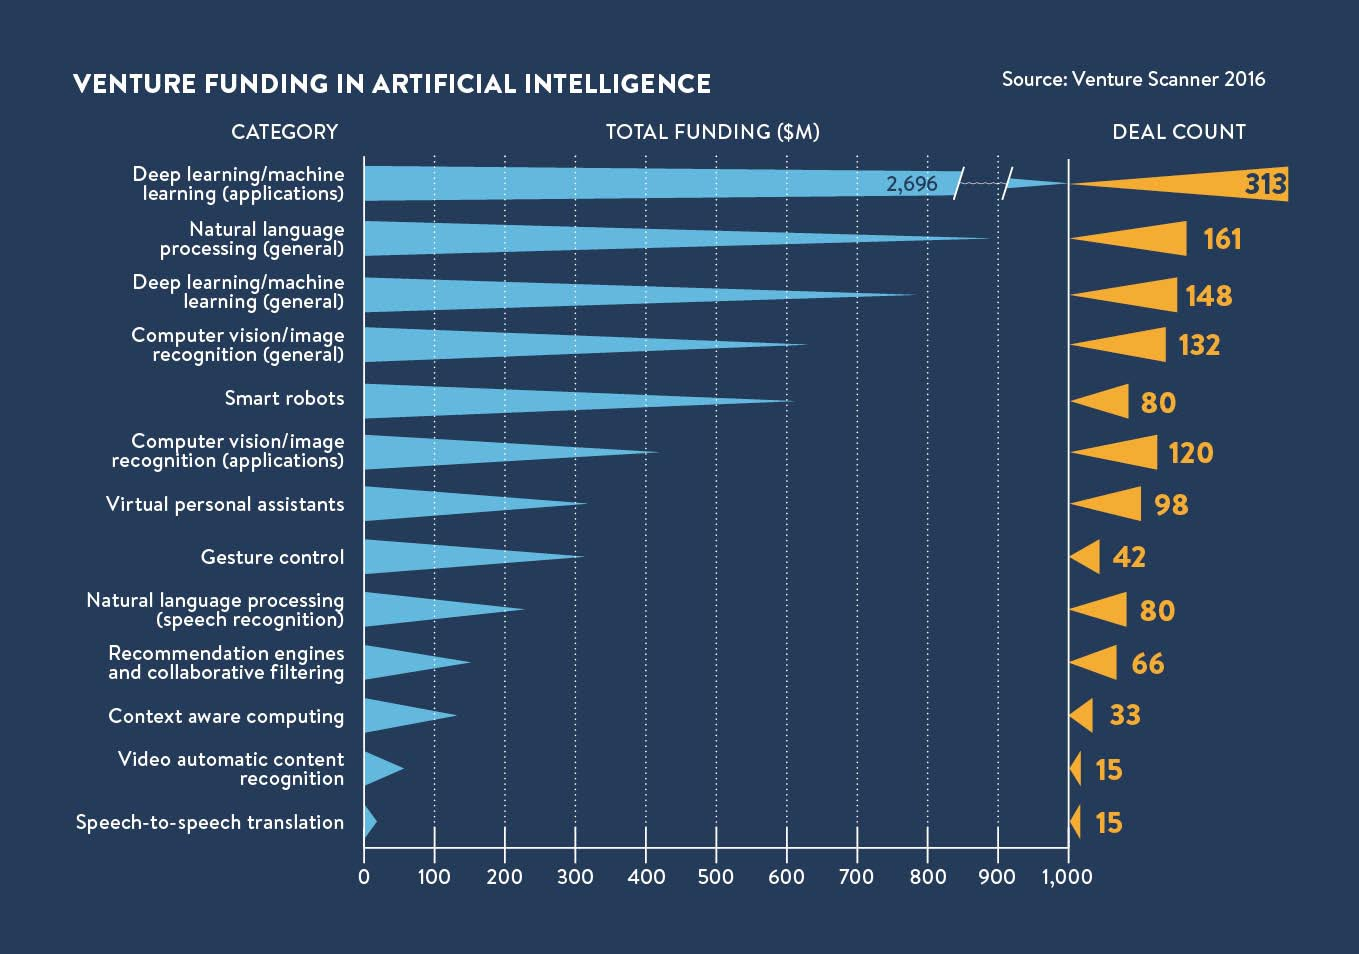 venture funding in AI